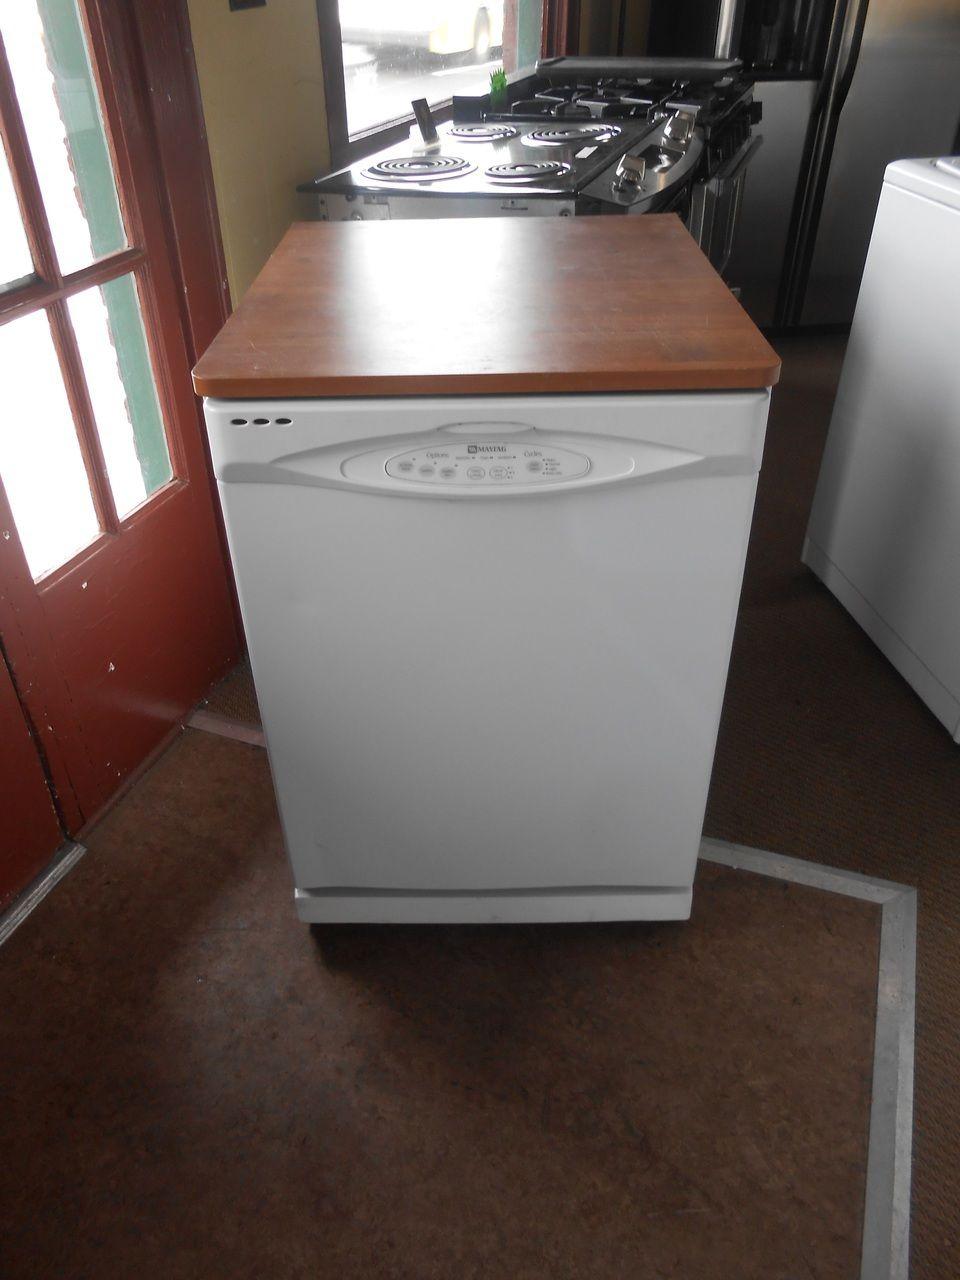 Appliance City Maytag Portable Dishwasher 3 Cycle Plus Rinse